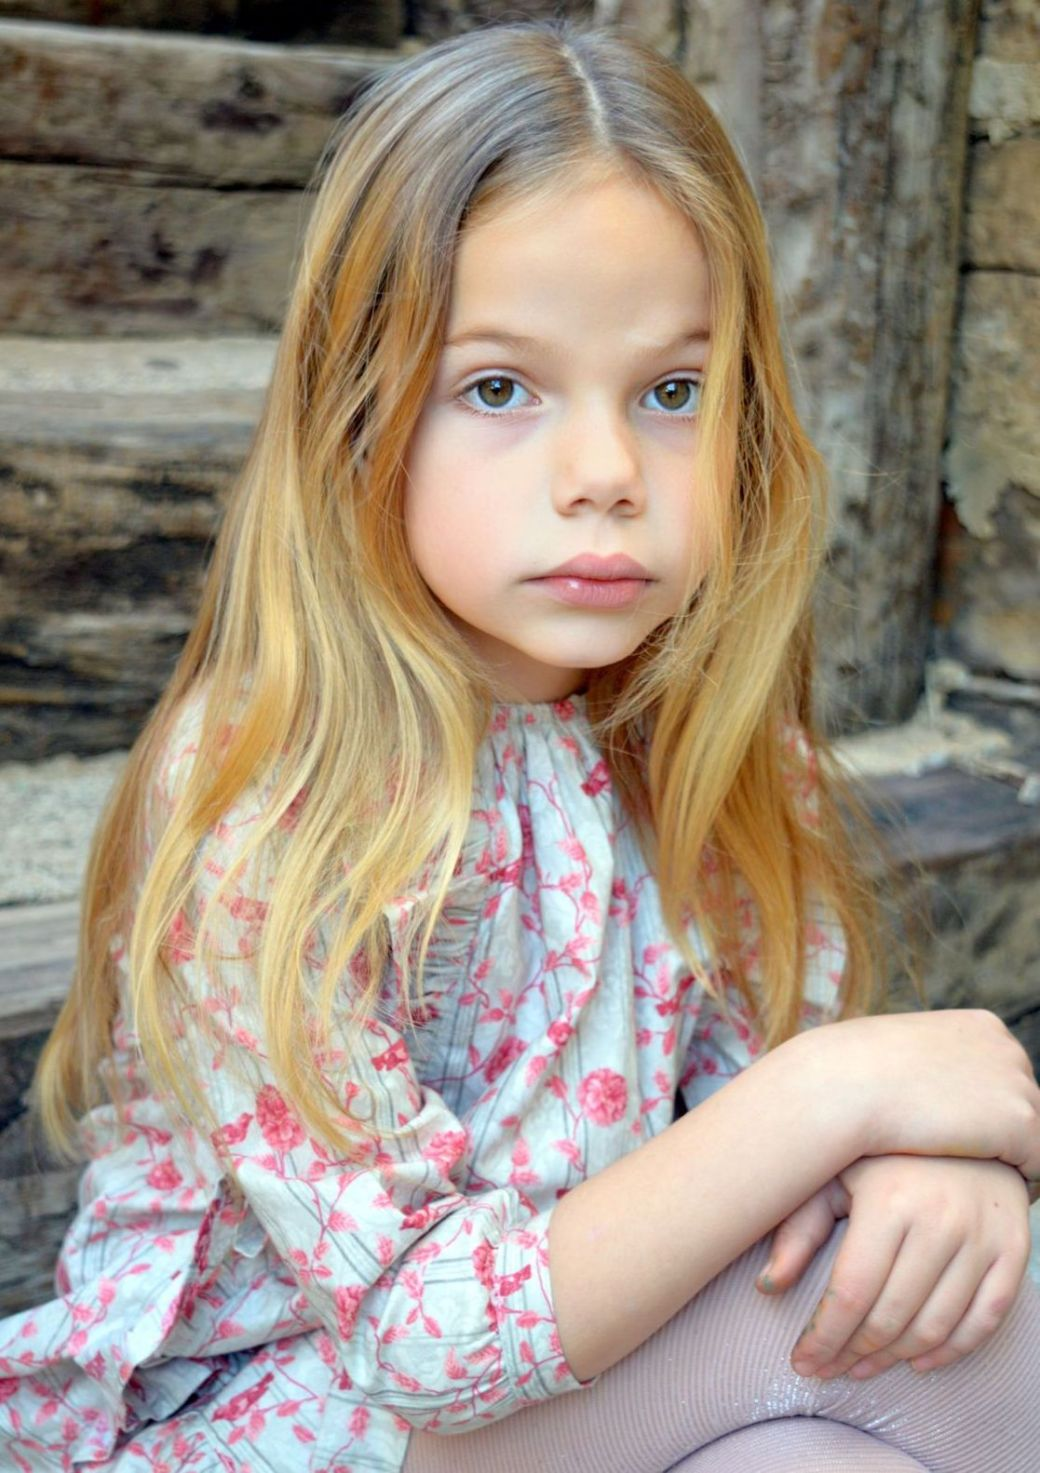 moodblue blog de moda infantil y juvenil